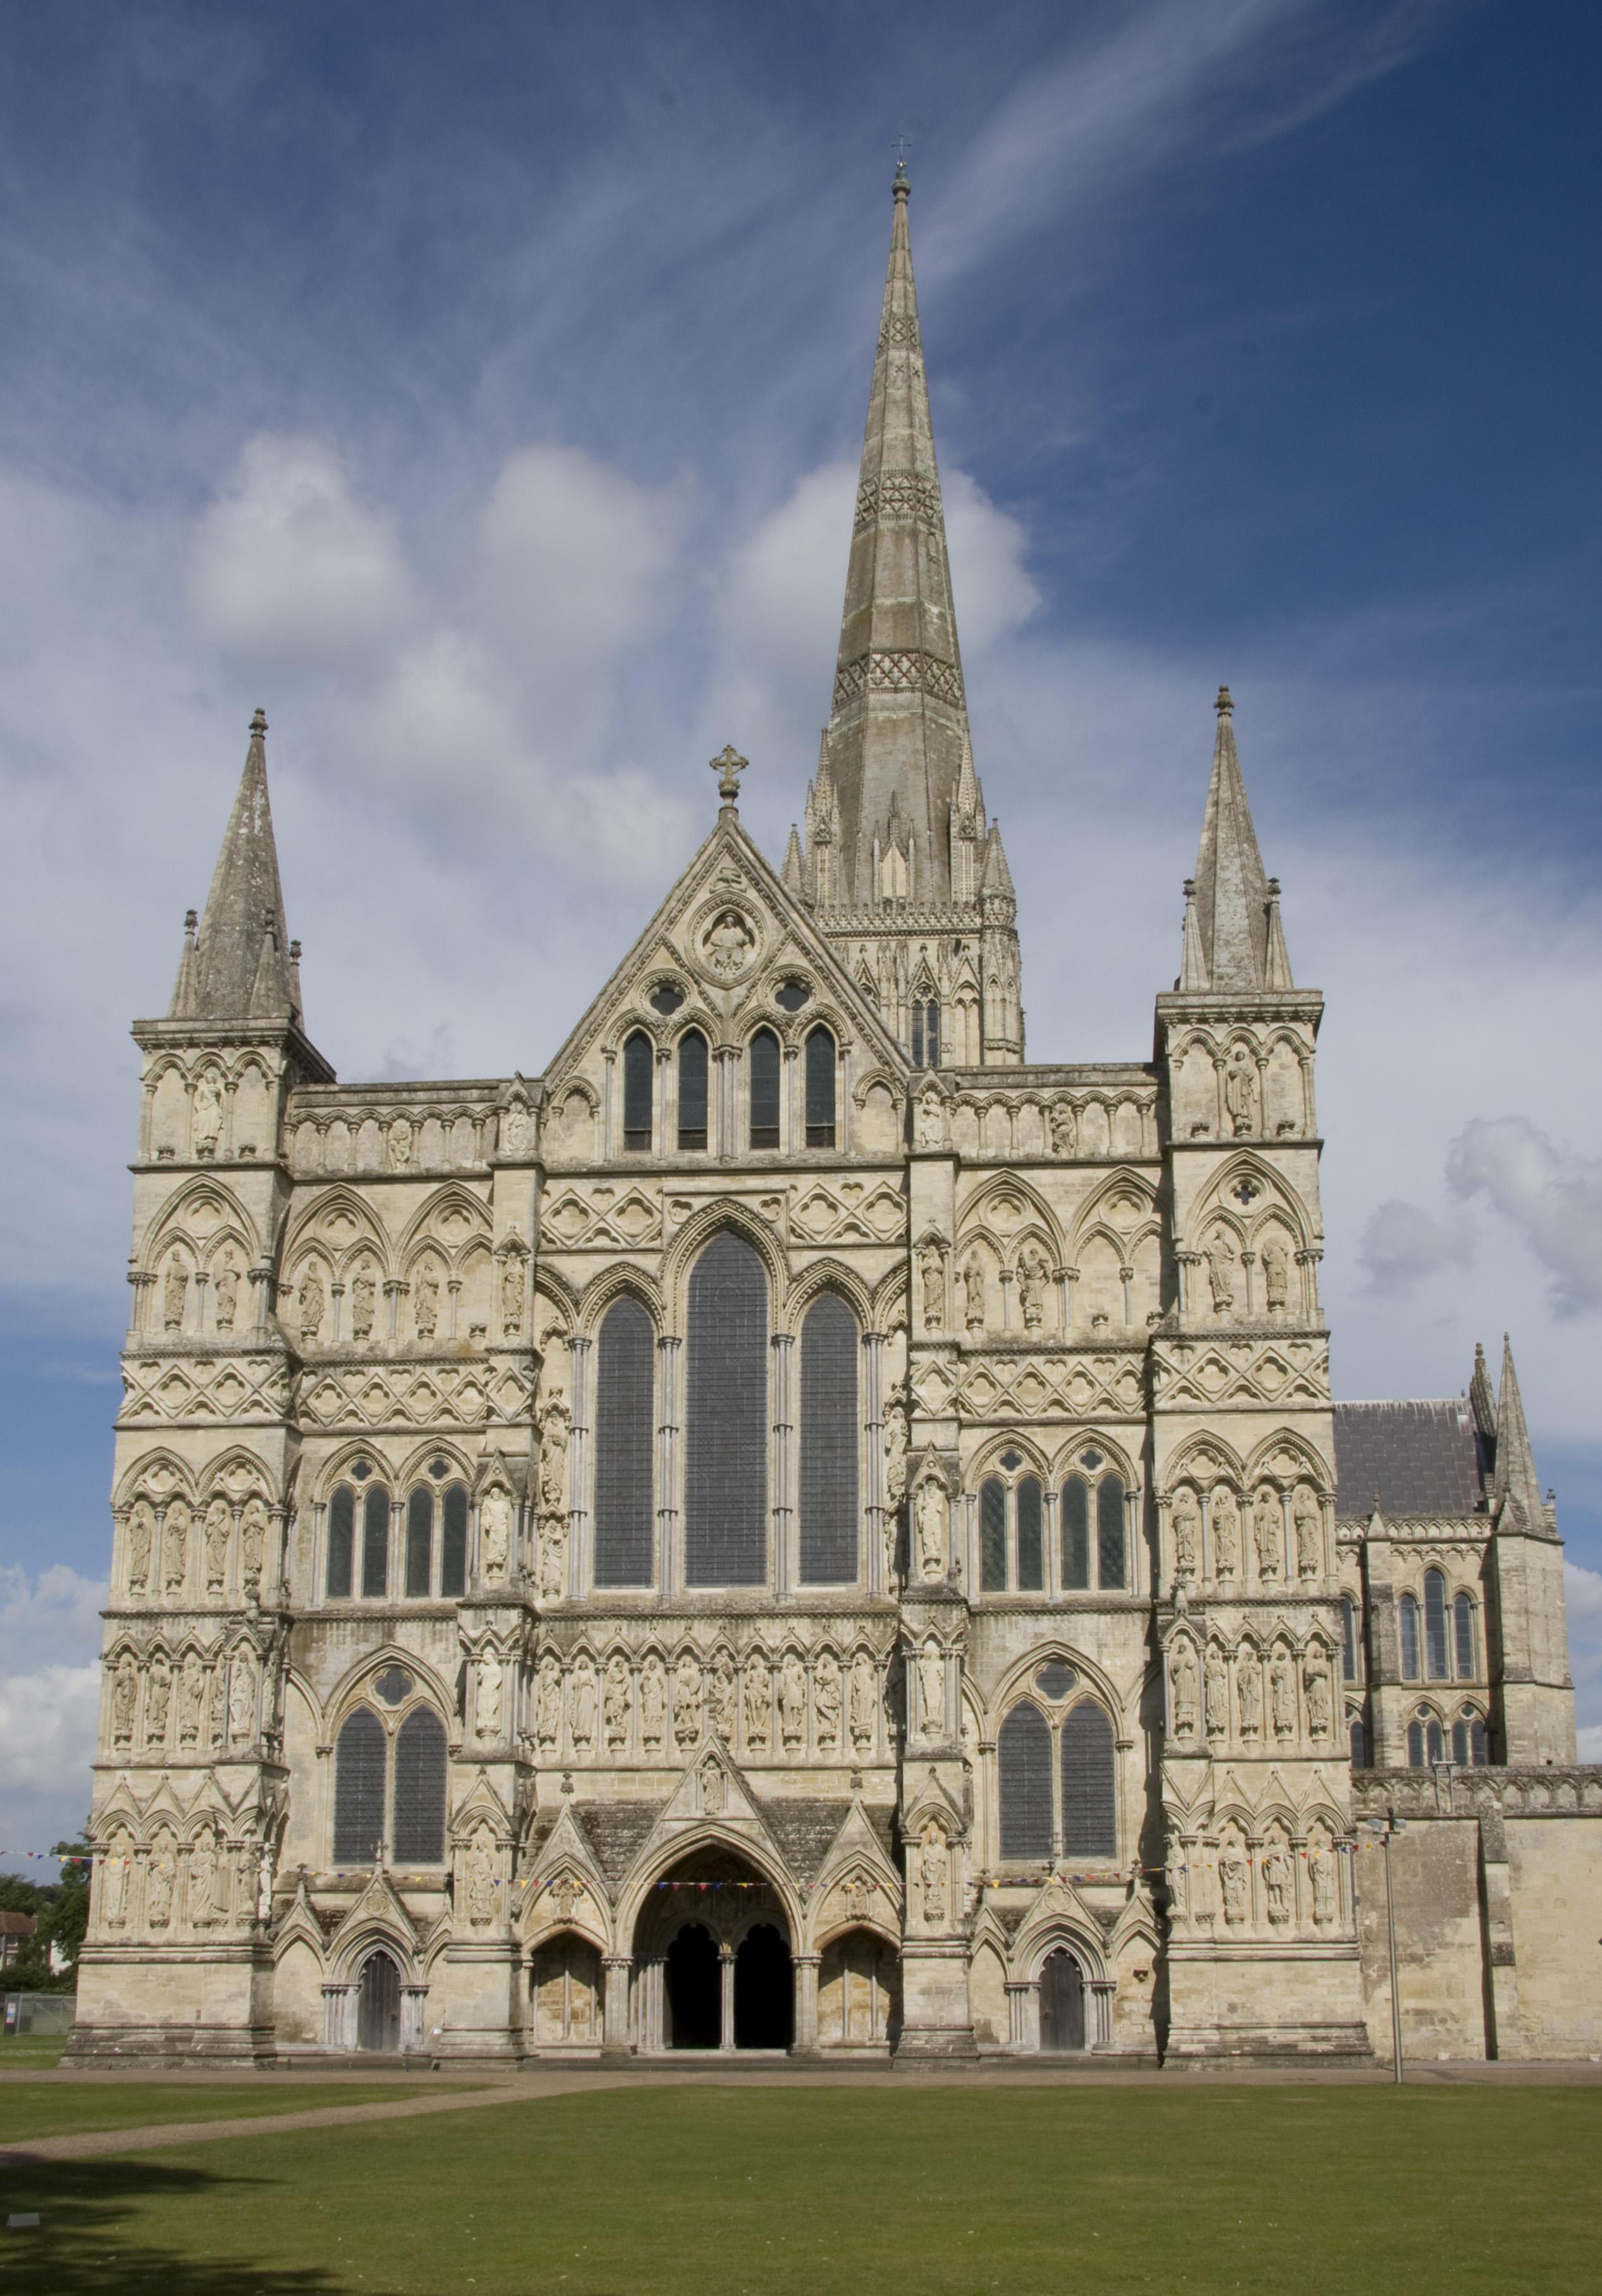 salisbury cathedral - photo #21